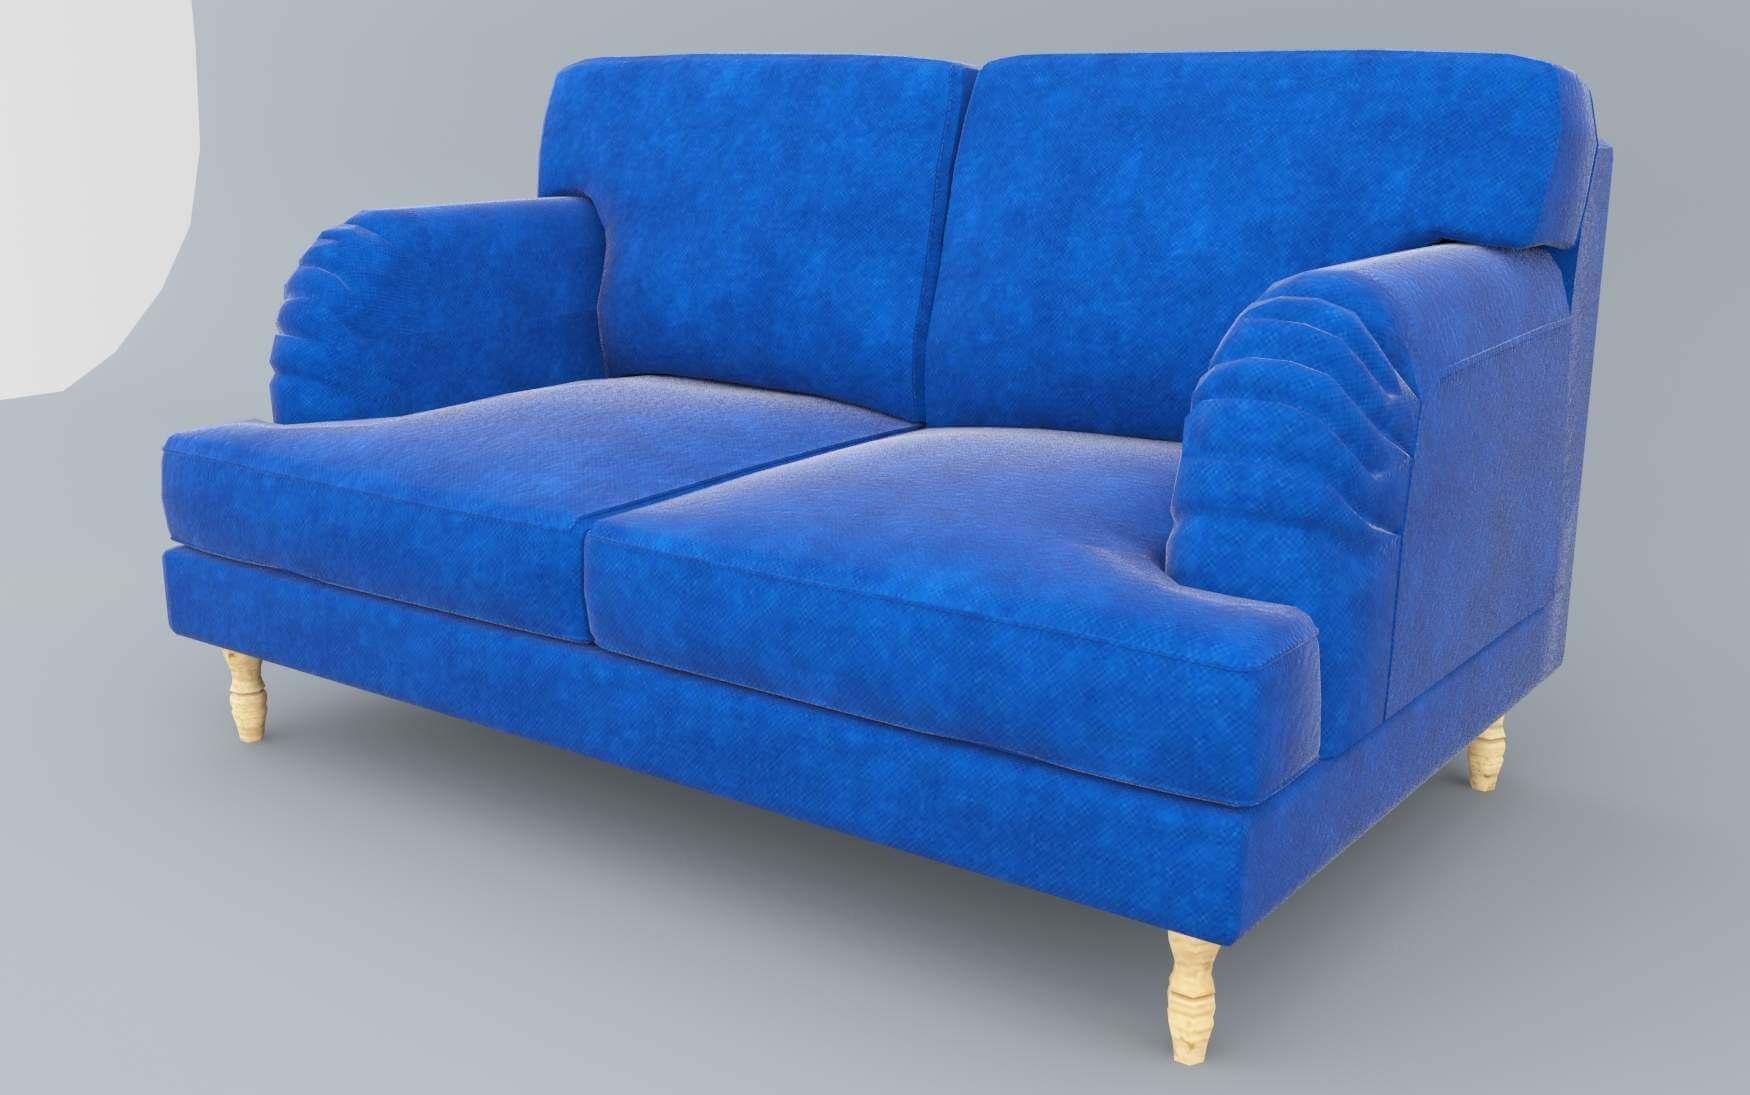 Ikea Socksund Sofa 3d Model